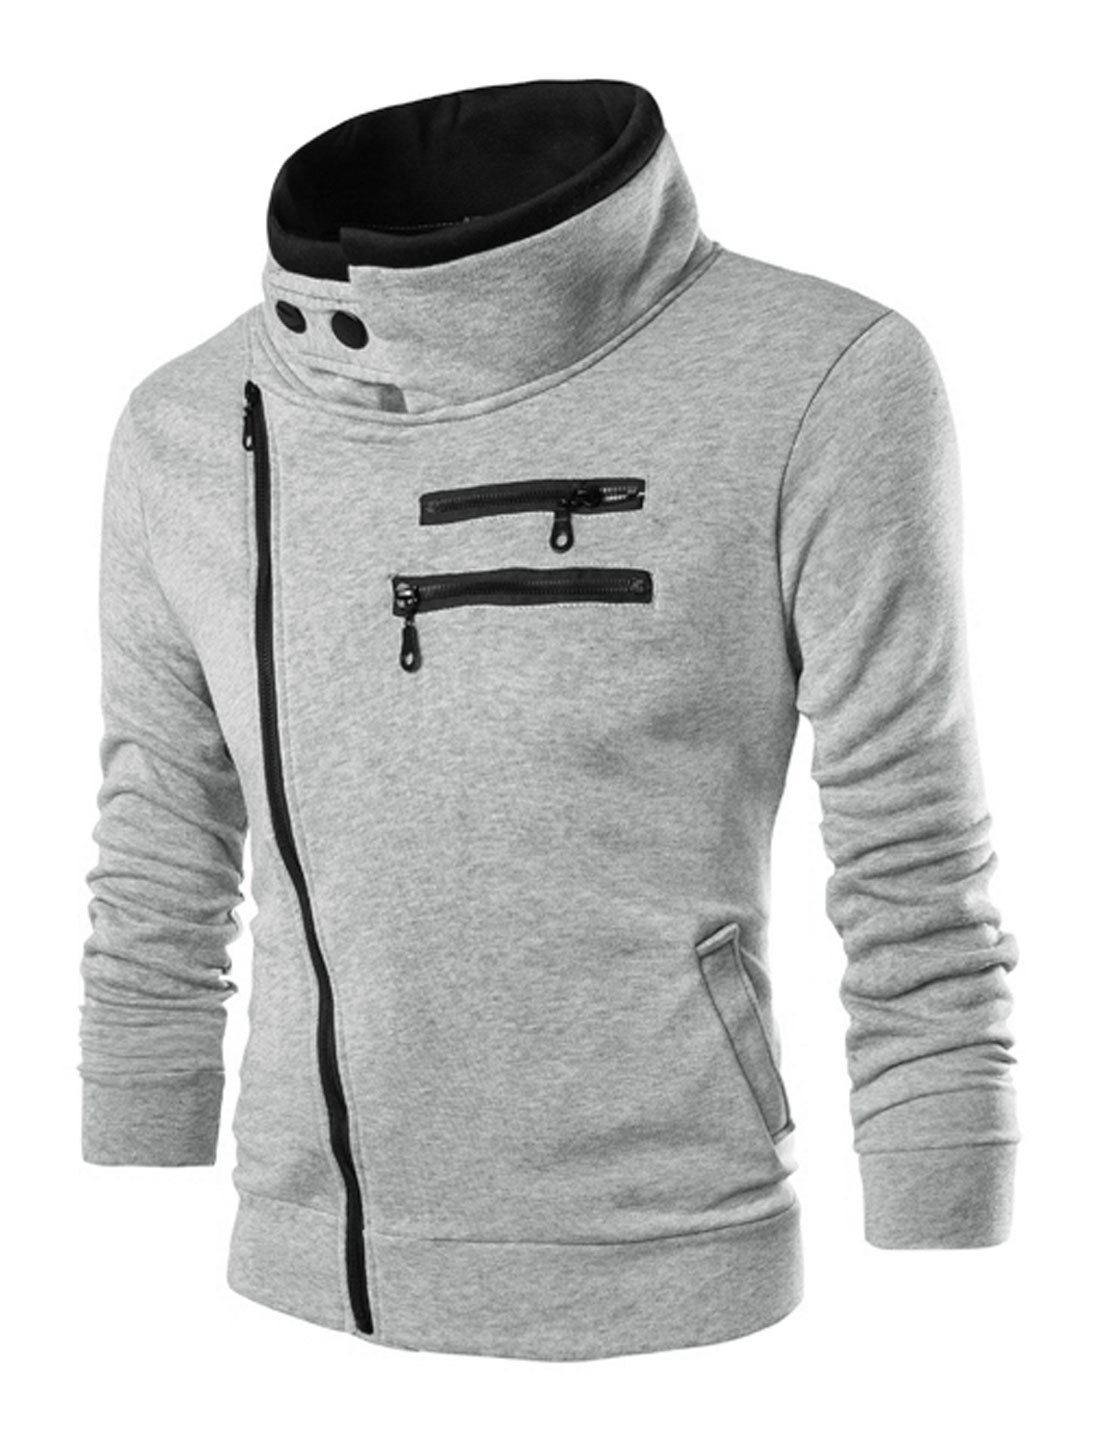 Men Long Sleece Inclined Zipper Front Pockets Jacket Light Gray M